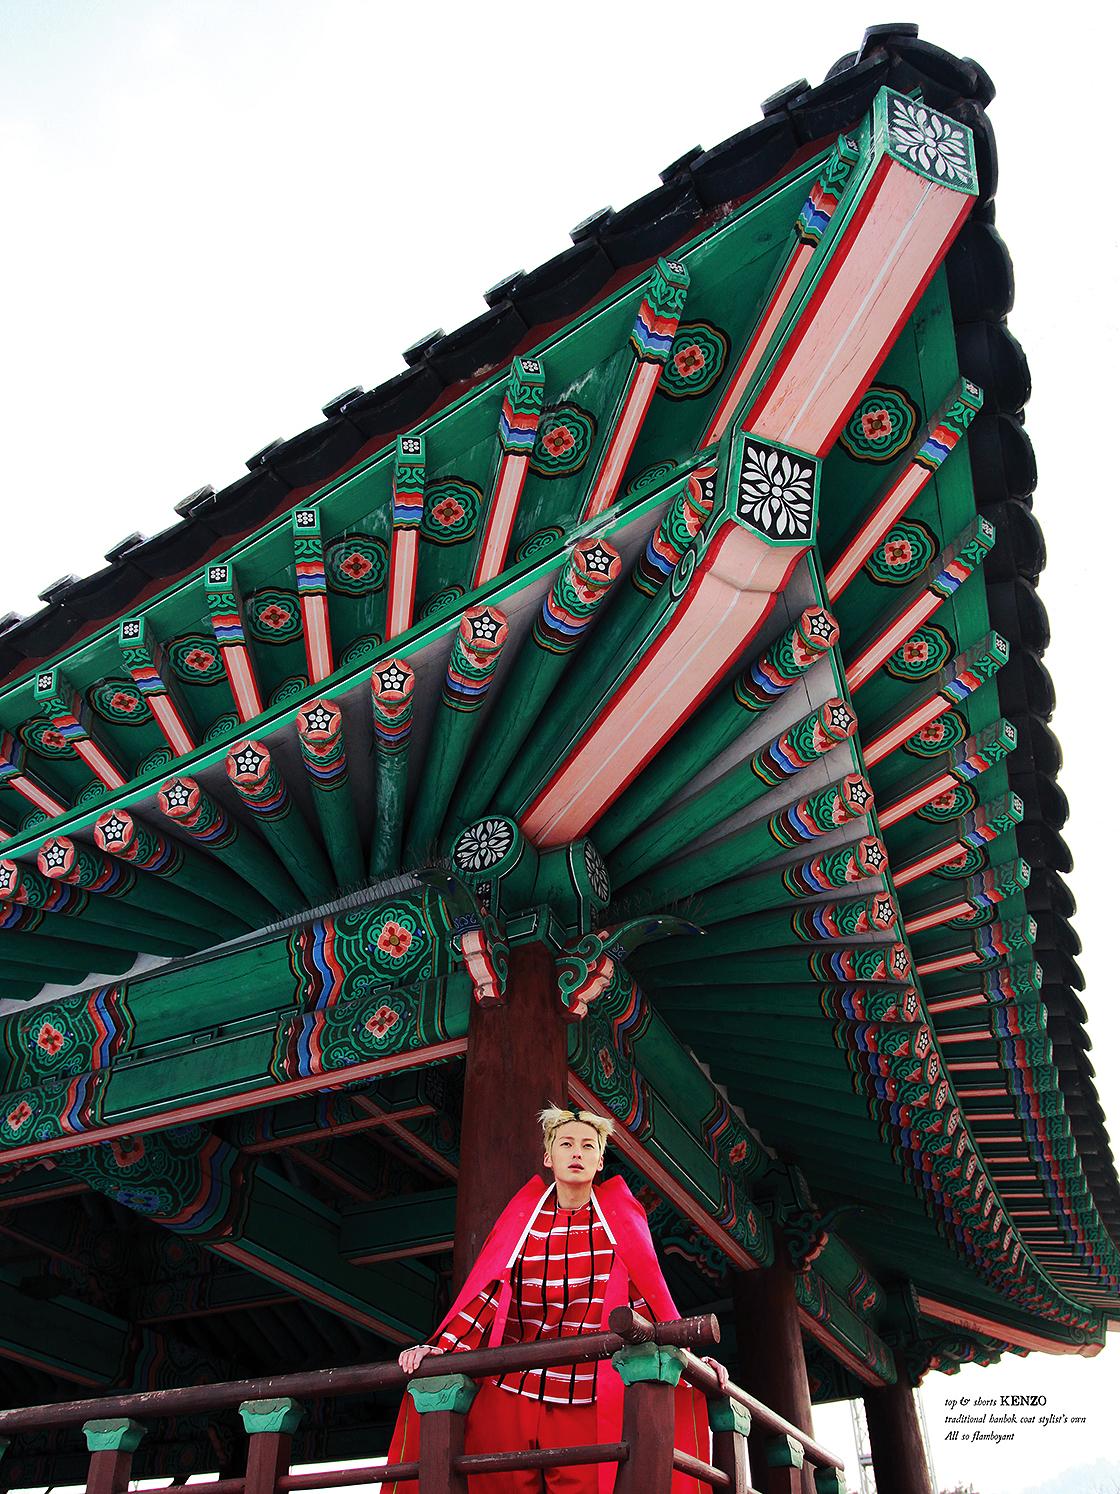 choonmong 3